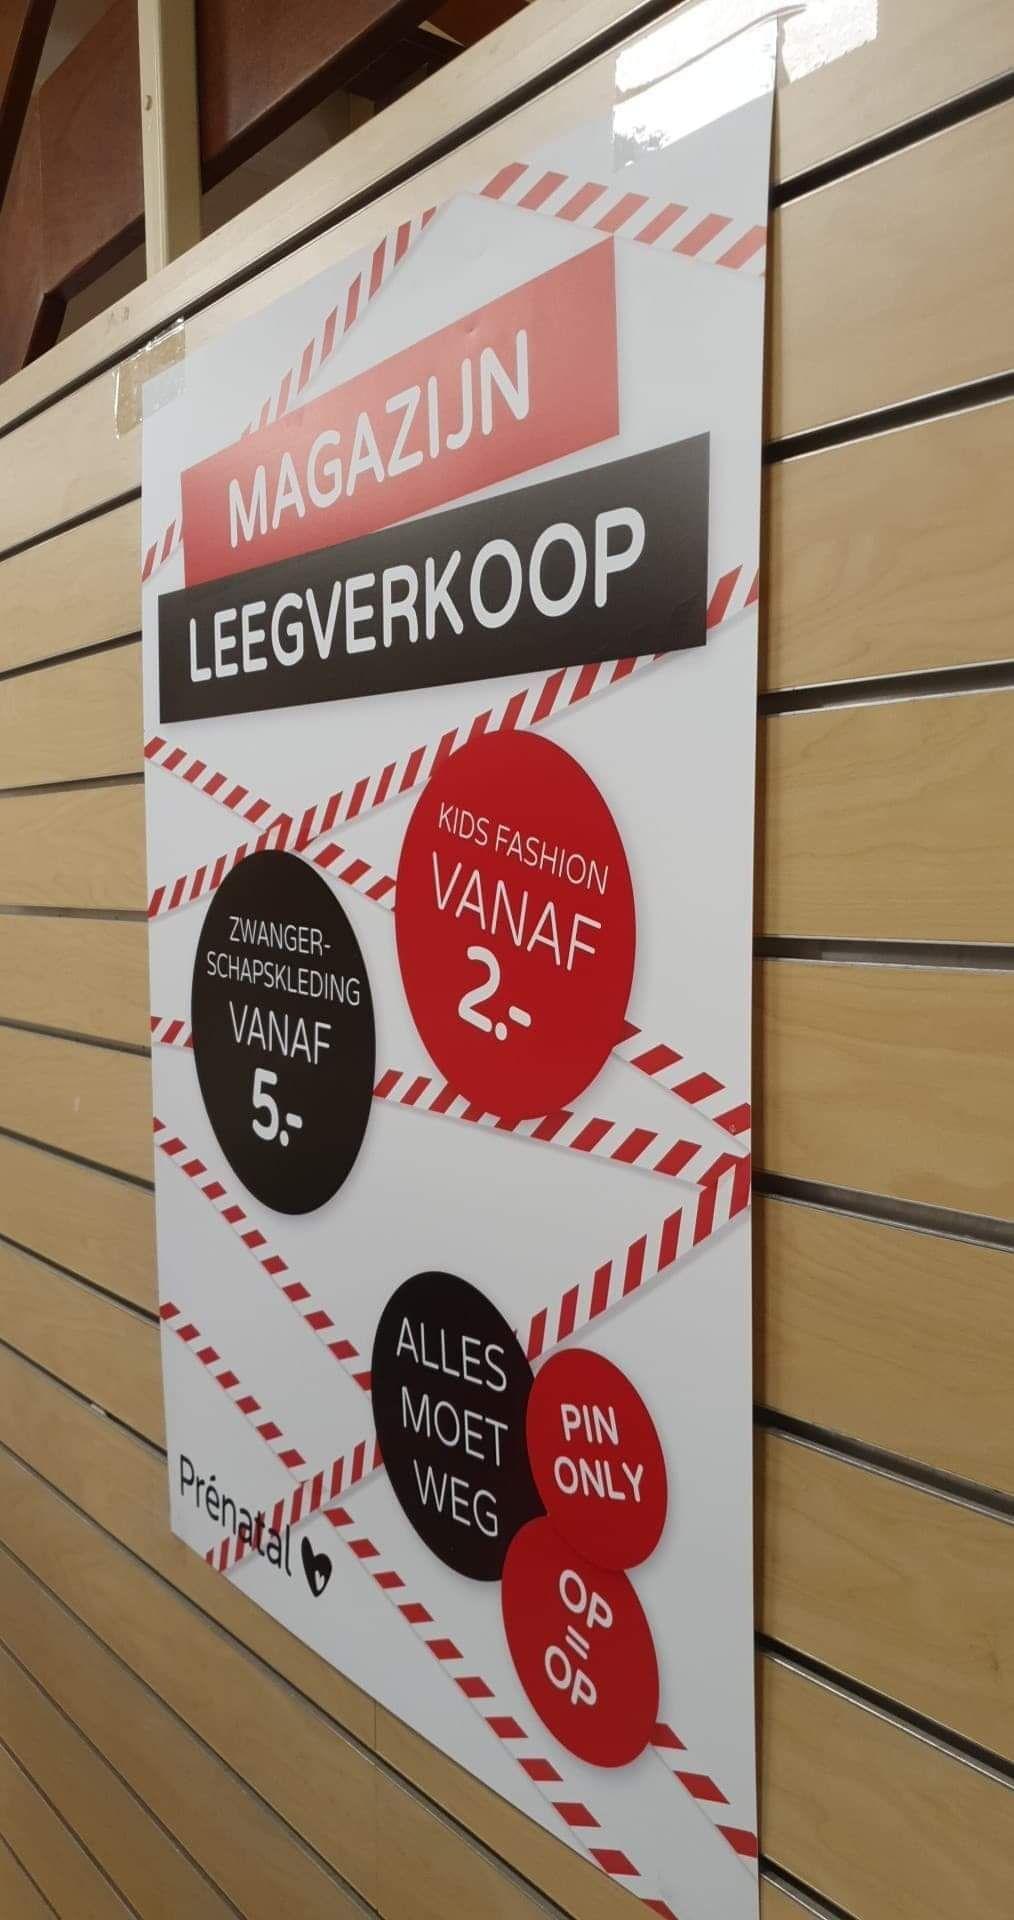 [Lokaal] Prenatal Aalsmeer - Magazijn leegverkoop